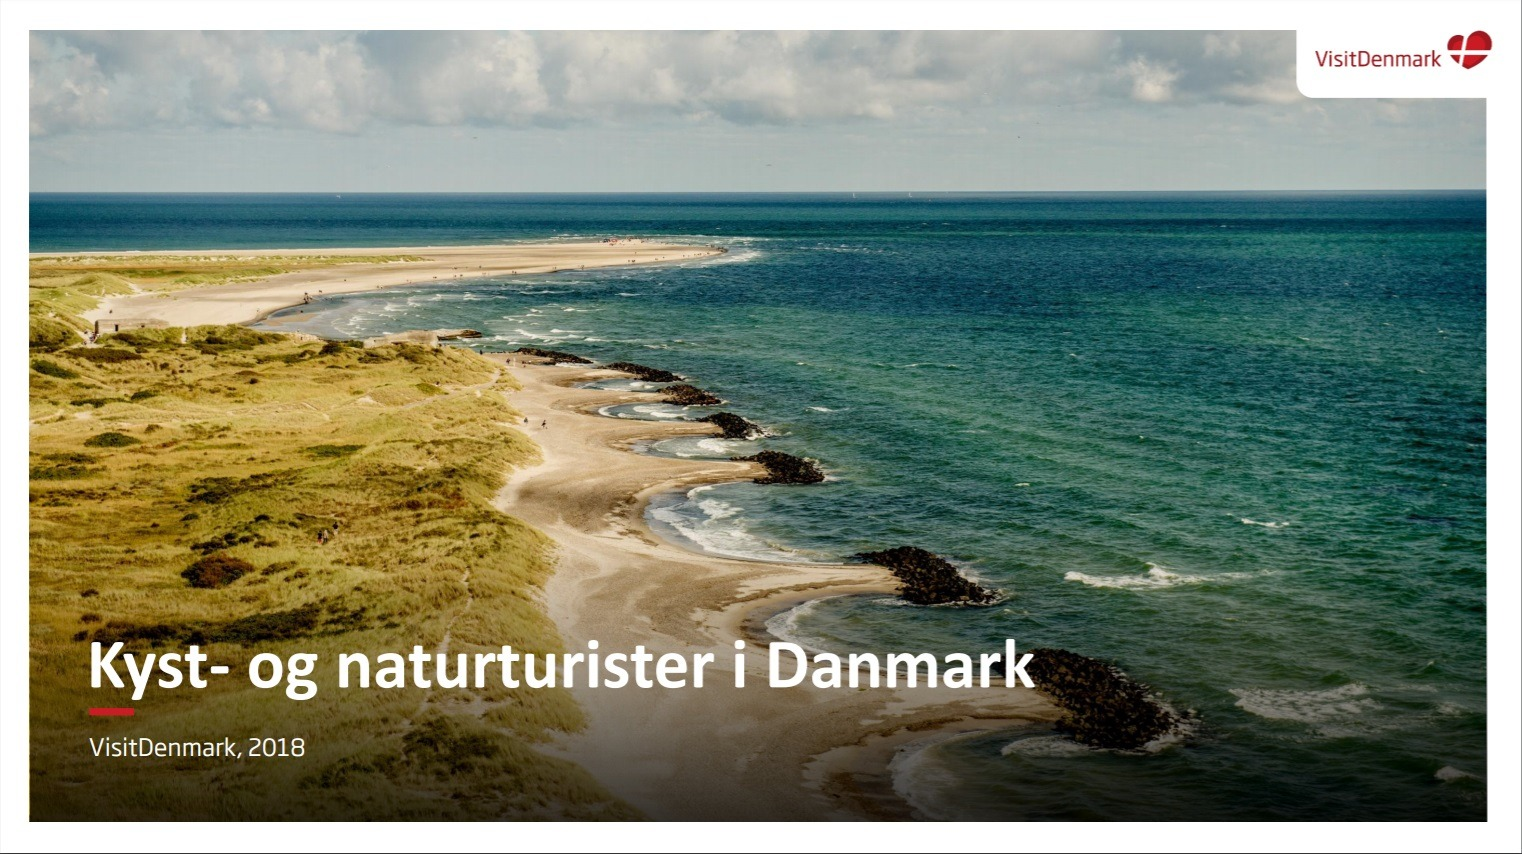 Kyst- og naturturister i Danmark